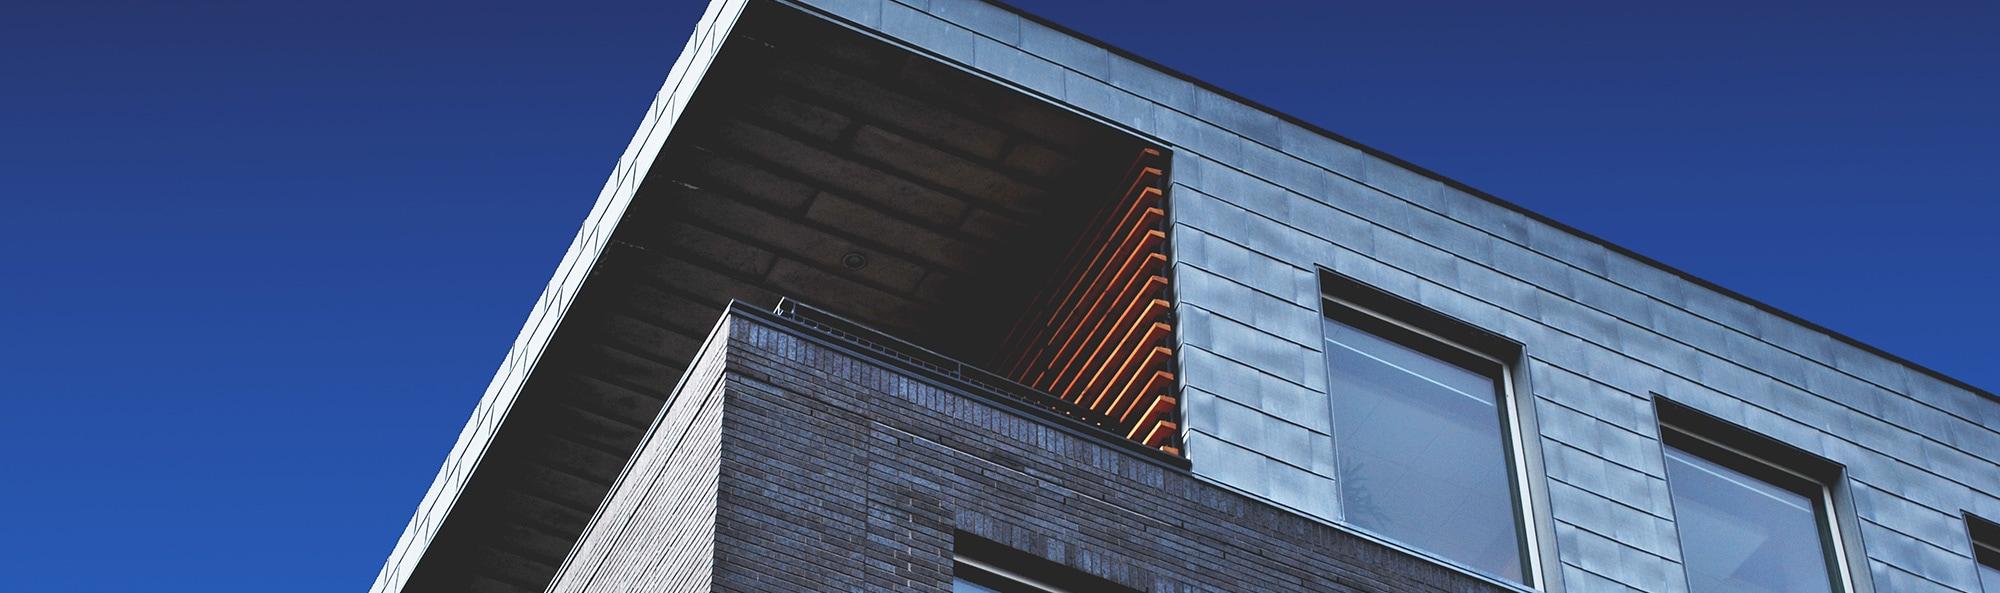 W-Quadrat Immobilienverwaltung